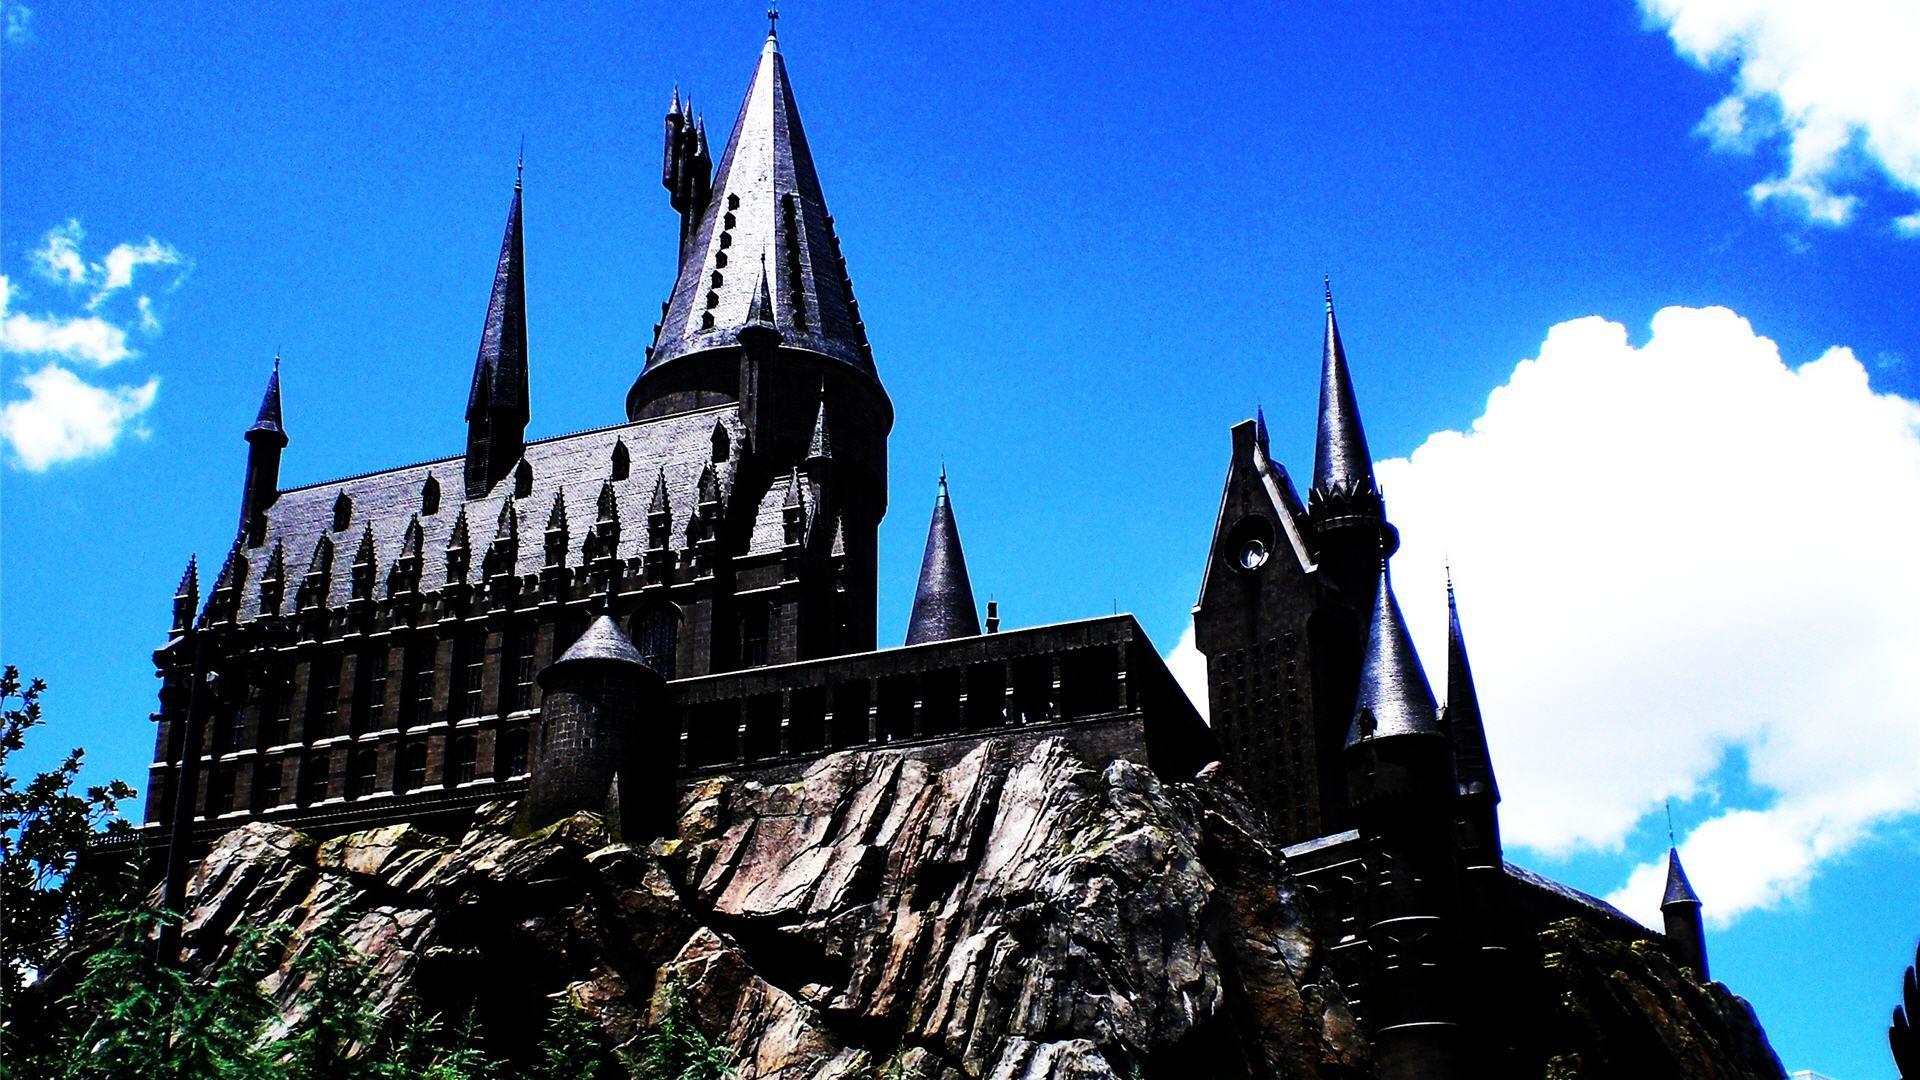 slytherin wallpaper hd 1080p – photo #6. Free Download Hogwarts Castle  Backgrounds – Wallpapercraft